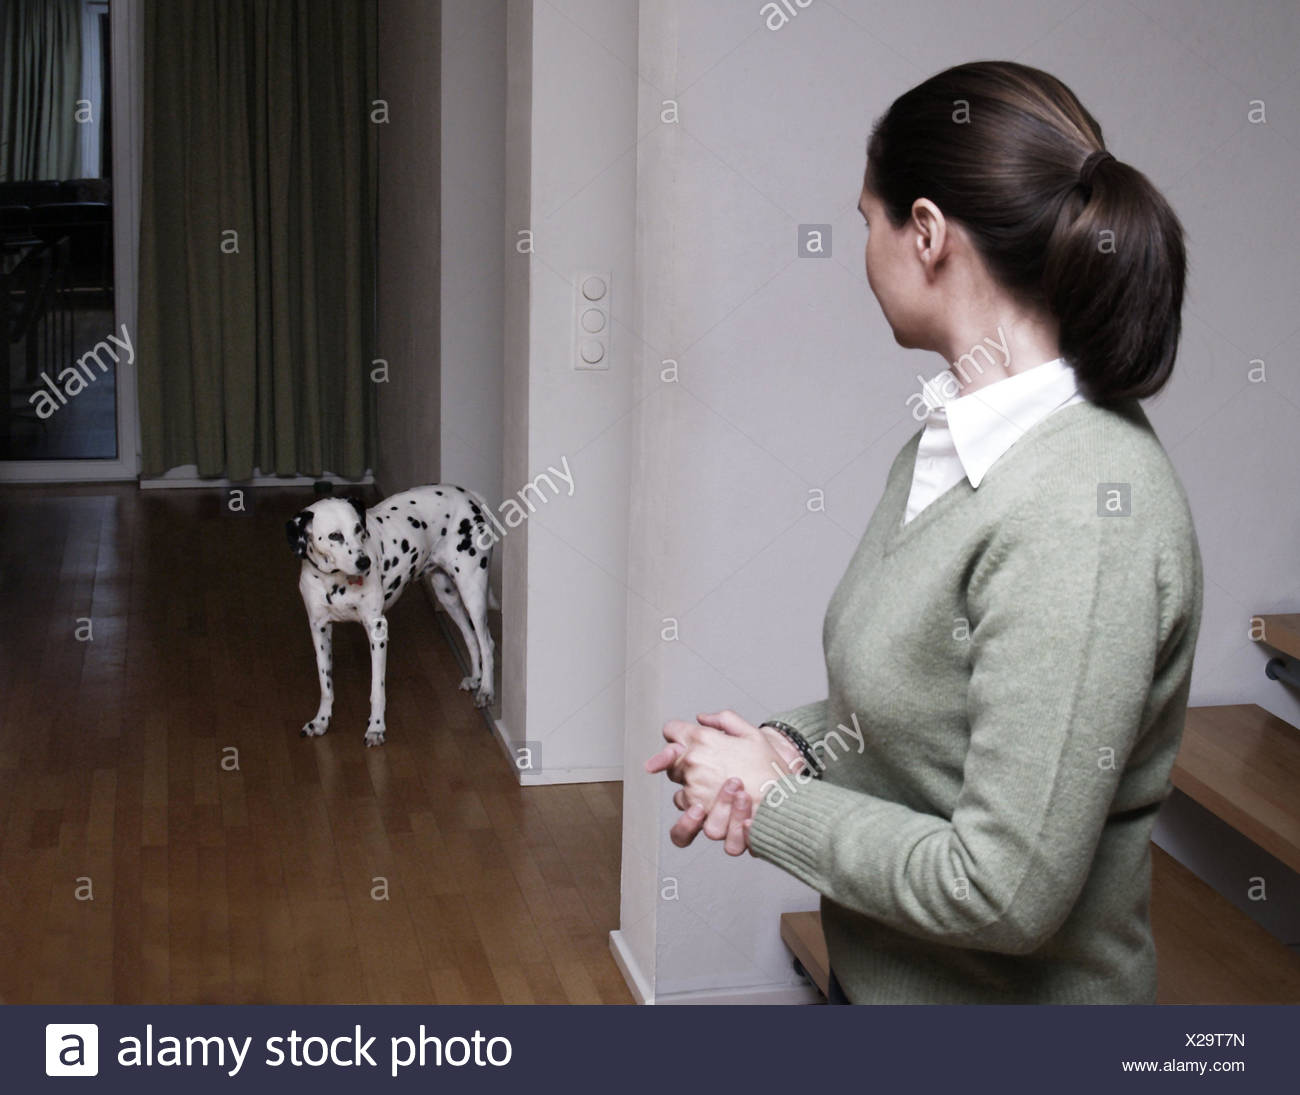 Fantastisch Flach, Frau, Dalmatiner, Blickkontakt, Parkett, Bodenbelag, Person,  Eigentümer,